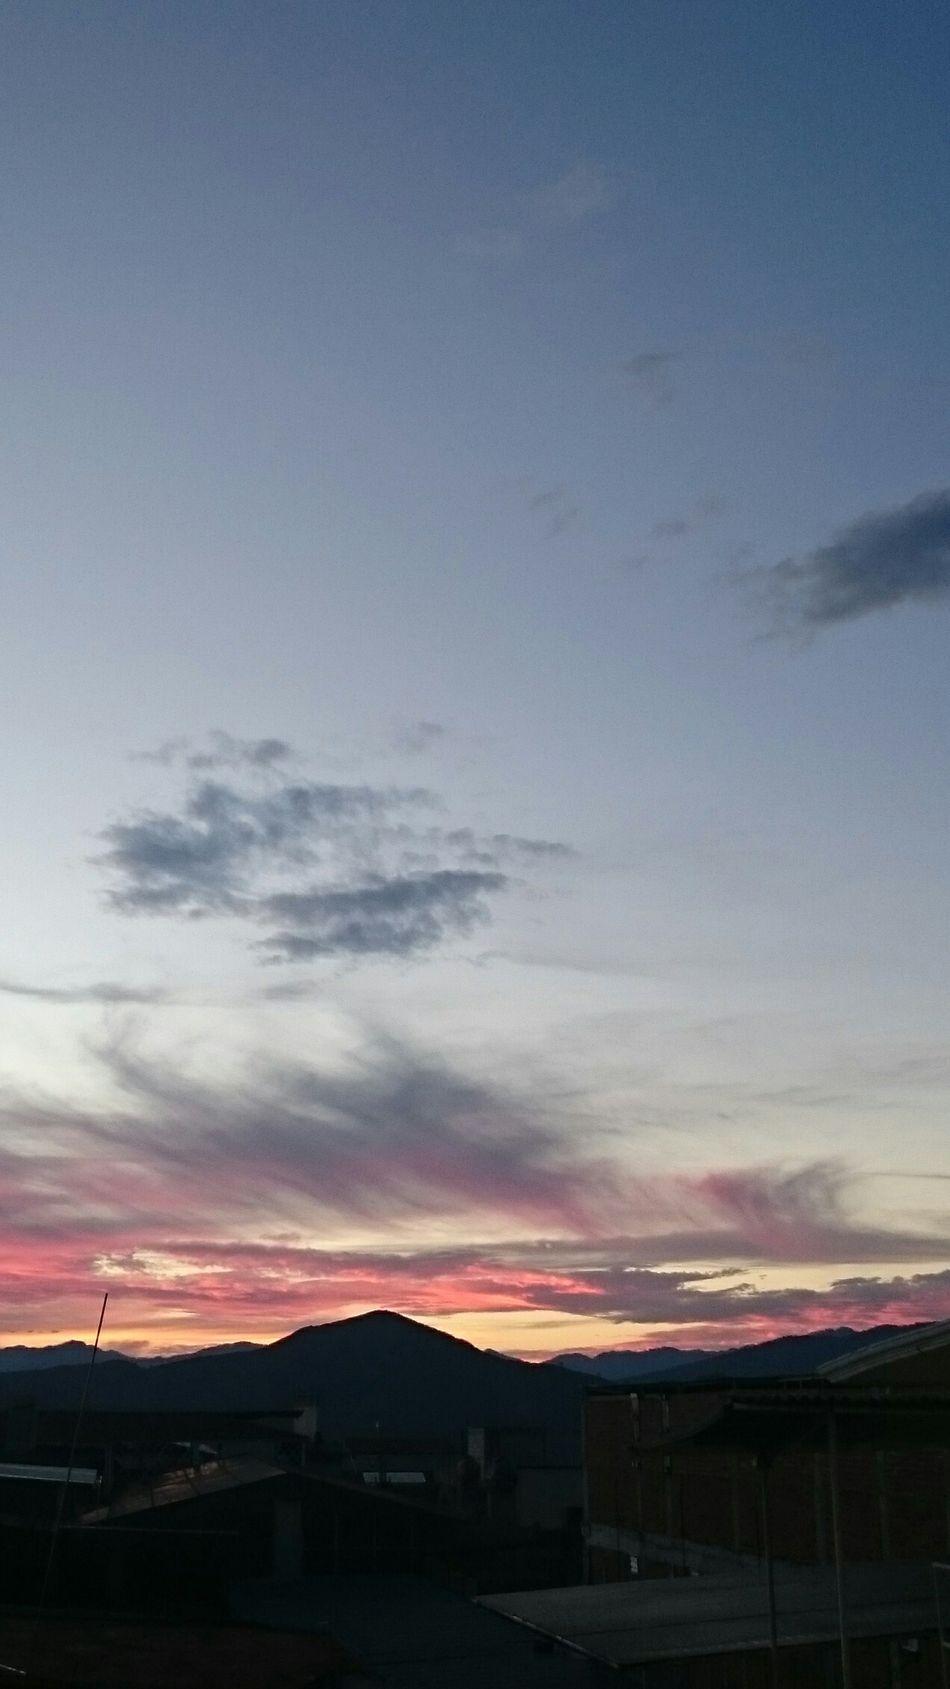 Mi pueblo del alma Mountain Sky Tourism Tranquility Red No People Cloud - Sky Scenics Mountain Range Atmosphere Michoacan, México MICHOACAN✌😘💯 Michocan Zitácuaro Atardecer Desdemiventana Mexico Original Photography Nofilter Mountain Sky City Cloud Blue Scenics